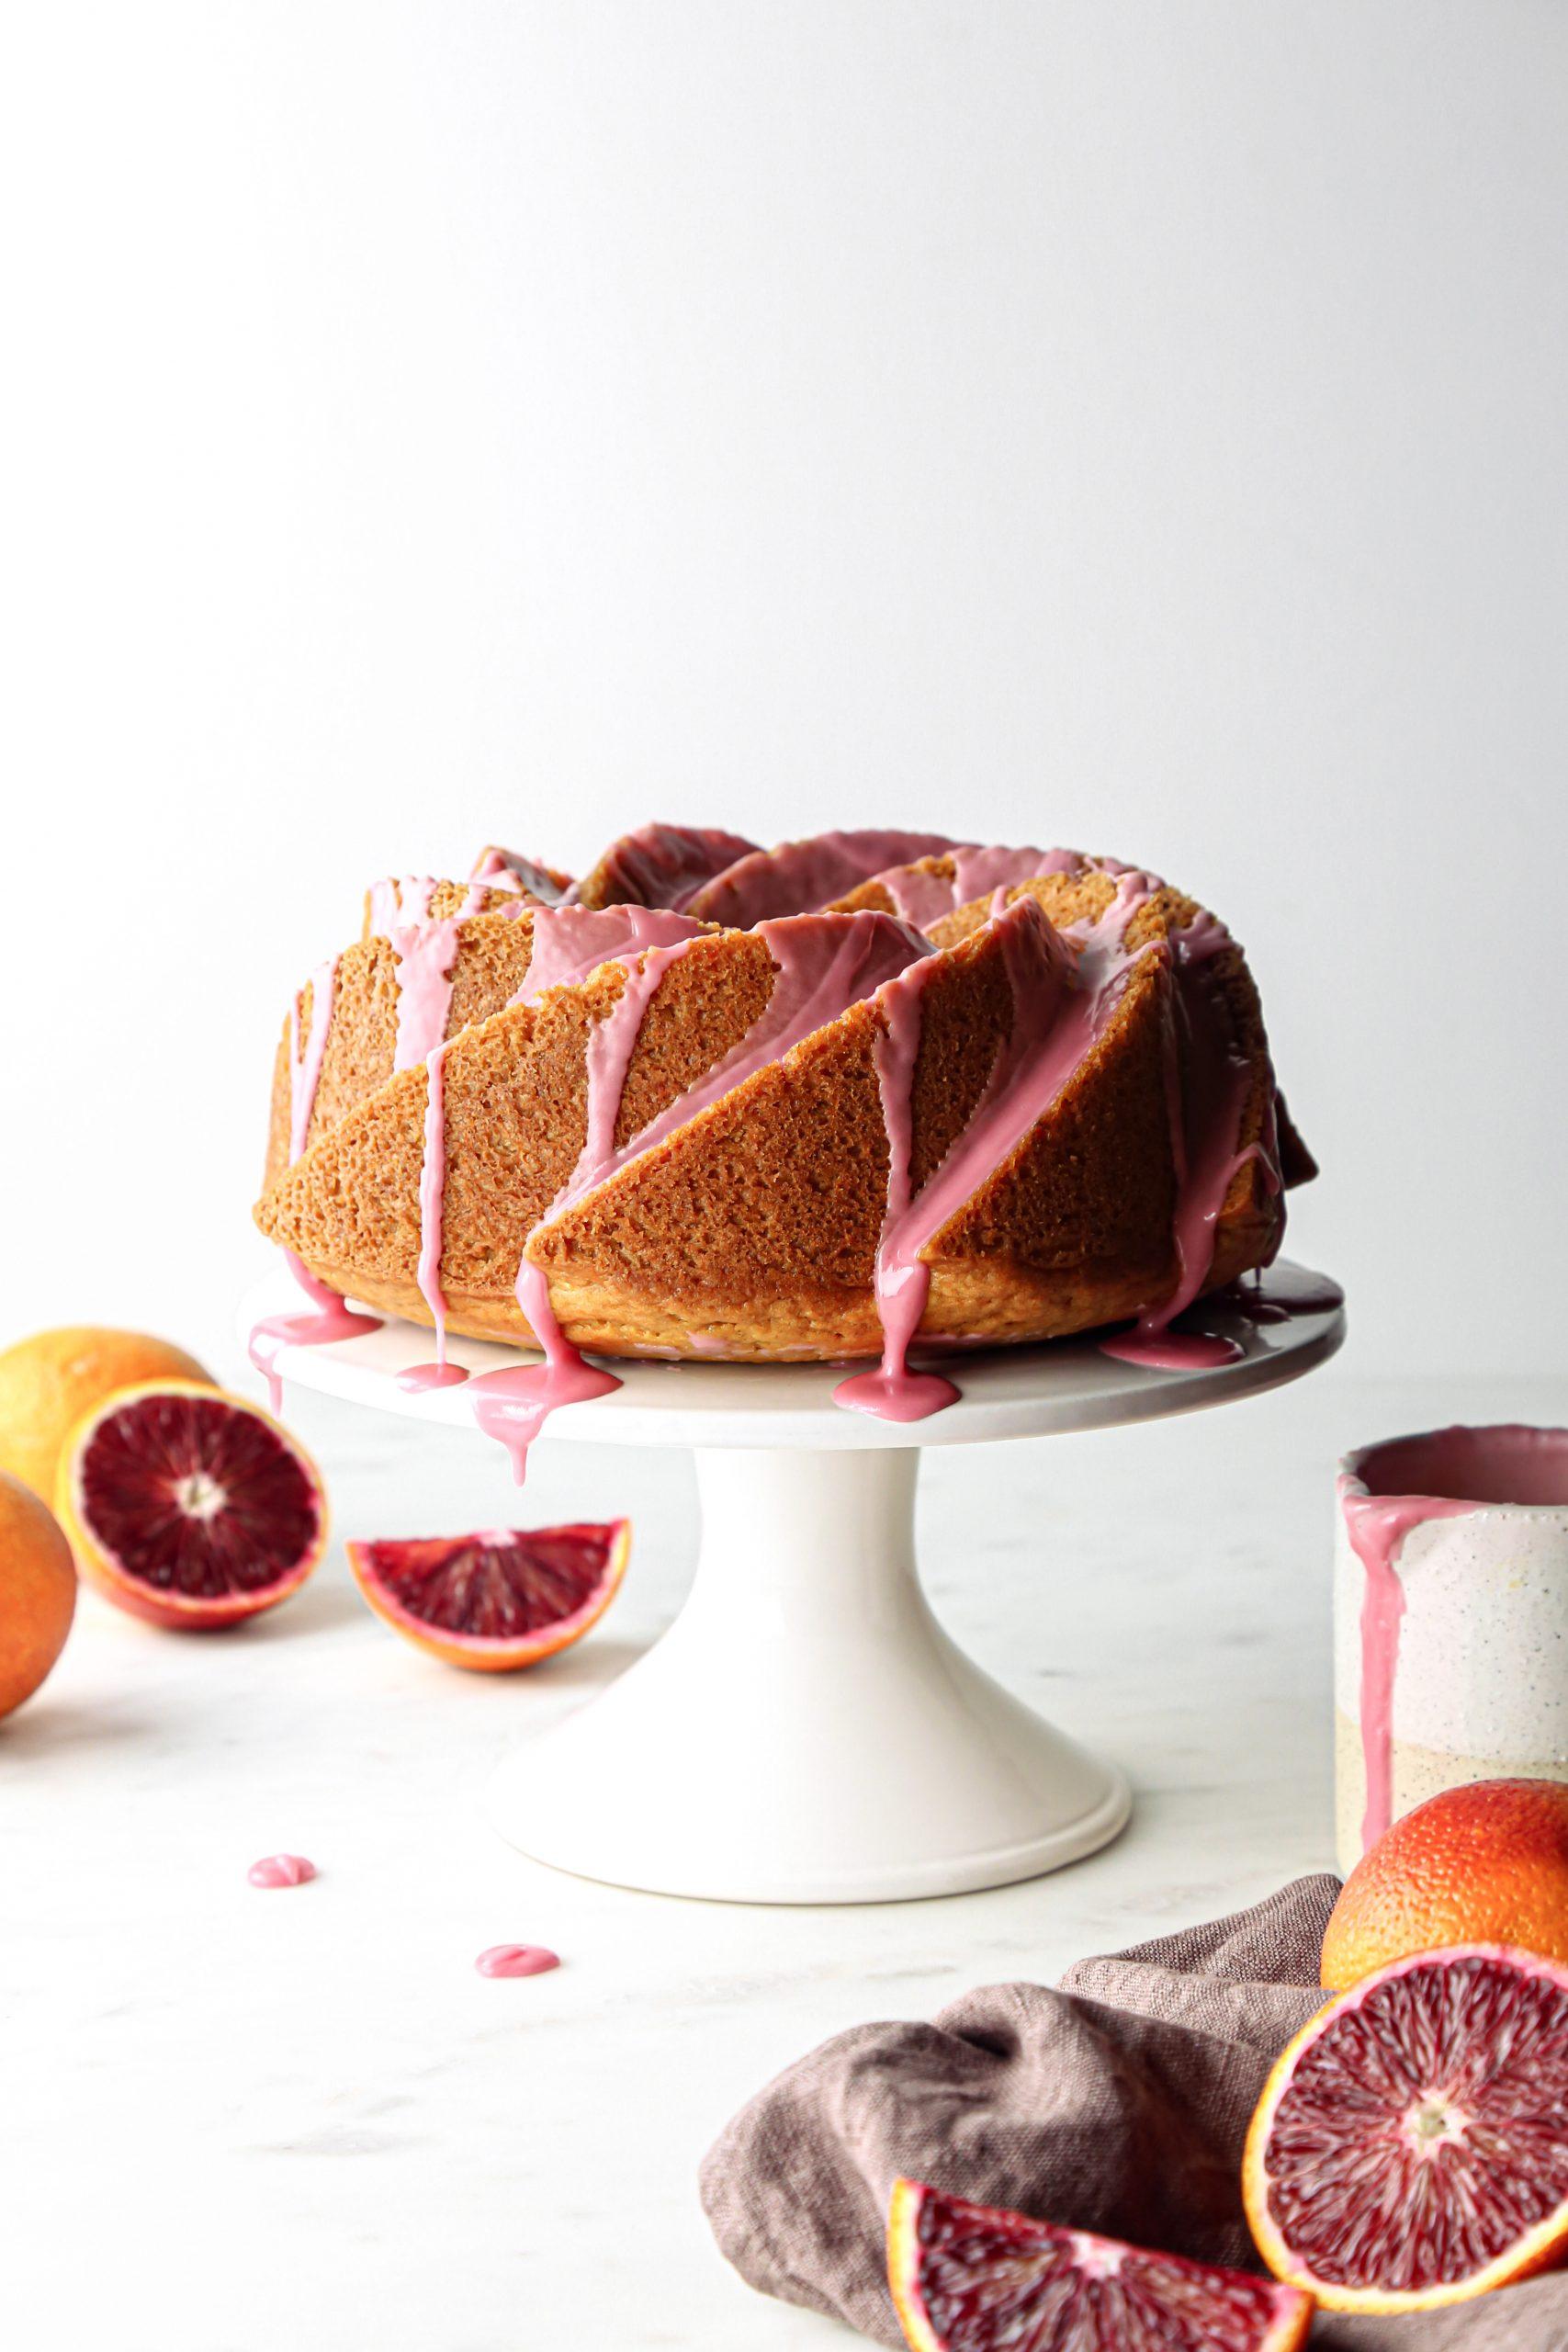 Blood Orange Bundt Cake | Vegan with refined sugar free and gluten free option.